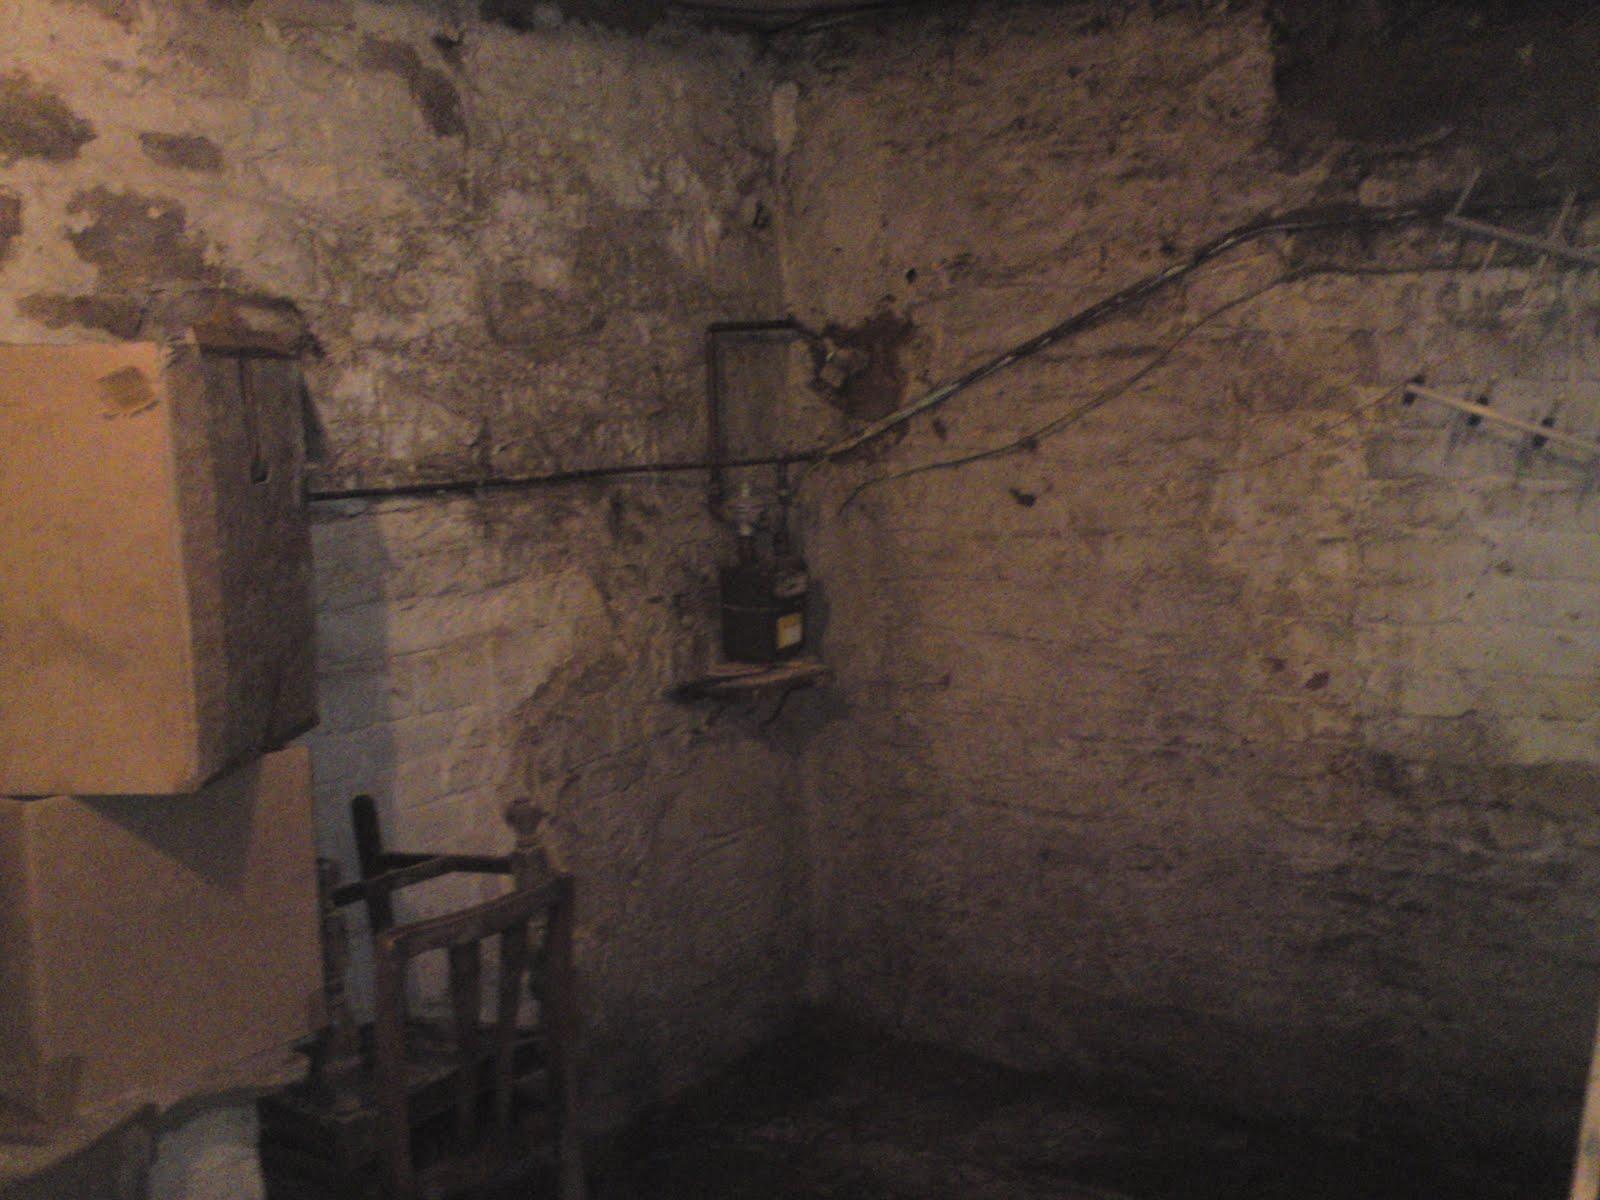 steve thorley photography it 39 s a creepy basement